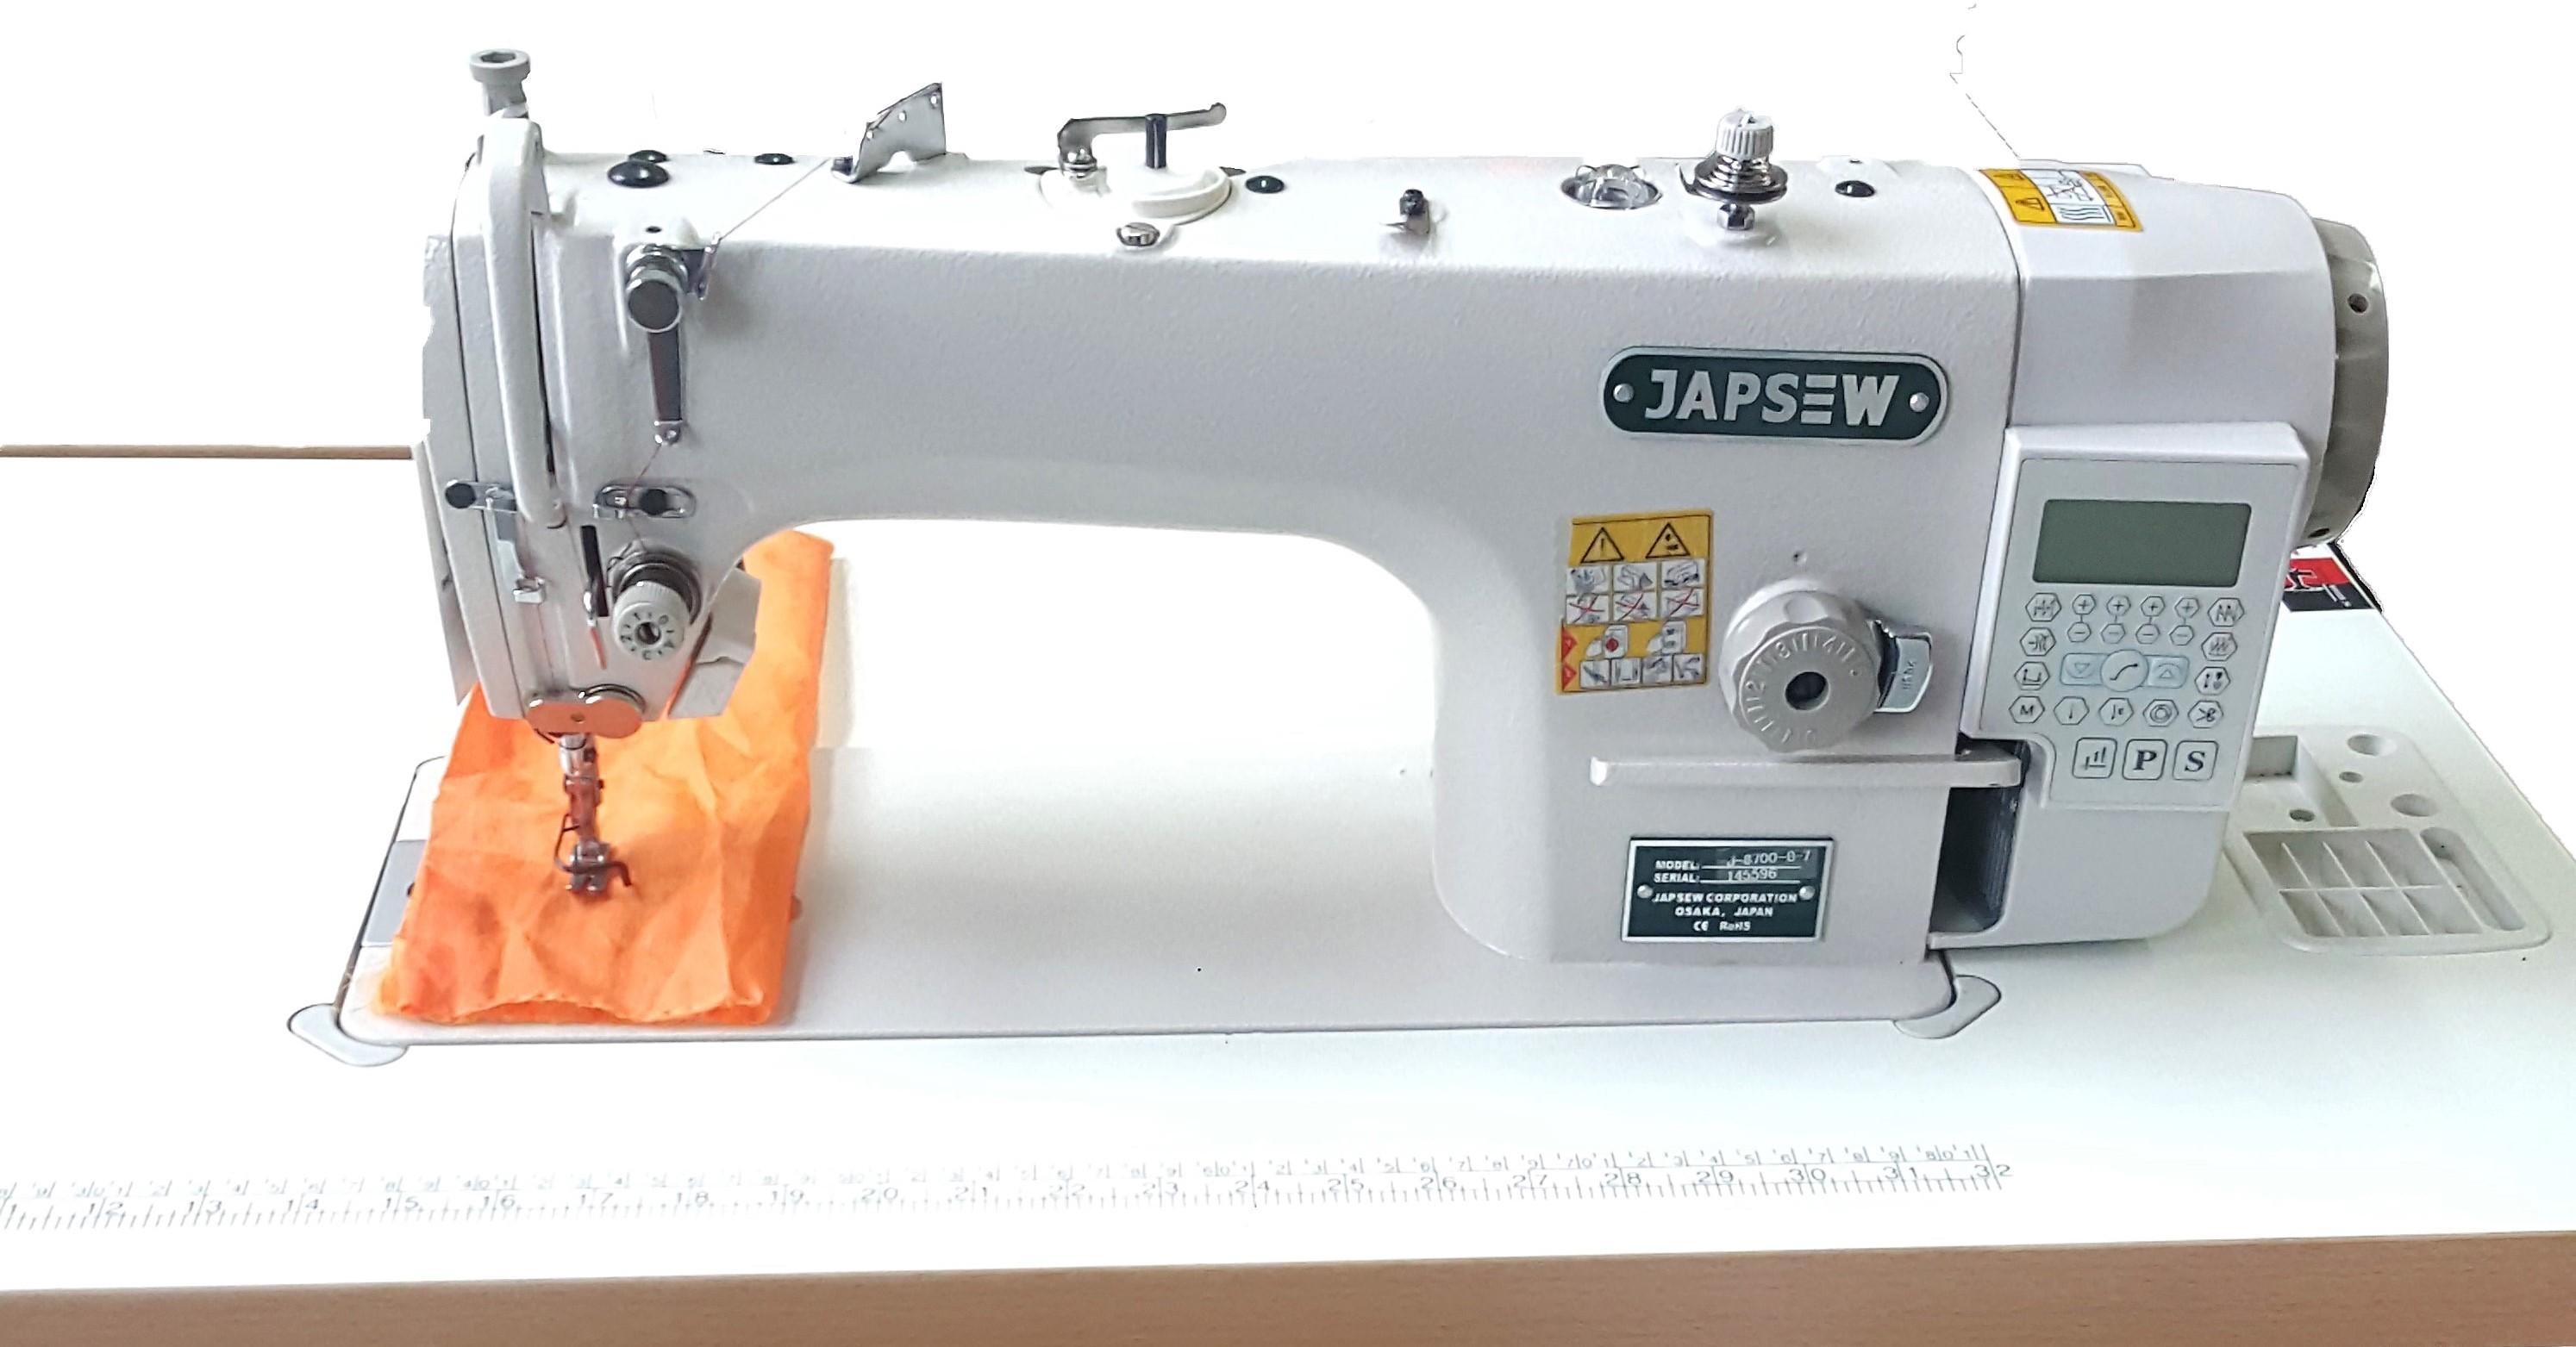 Masina de cusut industriala full automata Japsew J-8700-B-7 NOUA